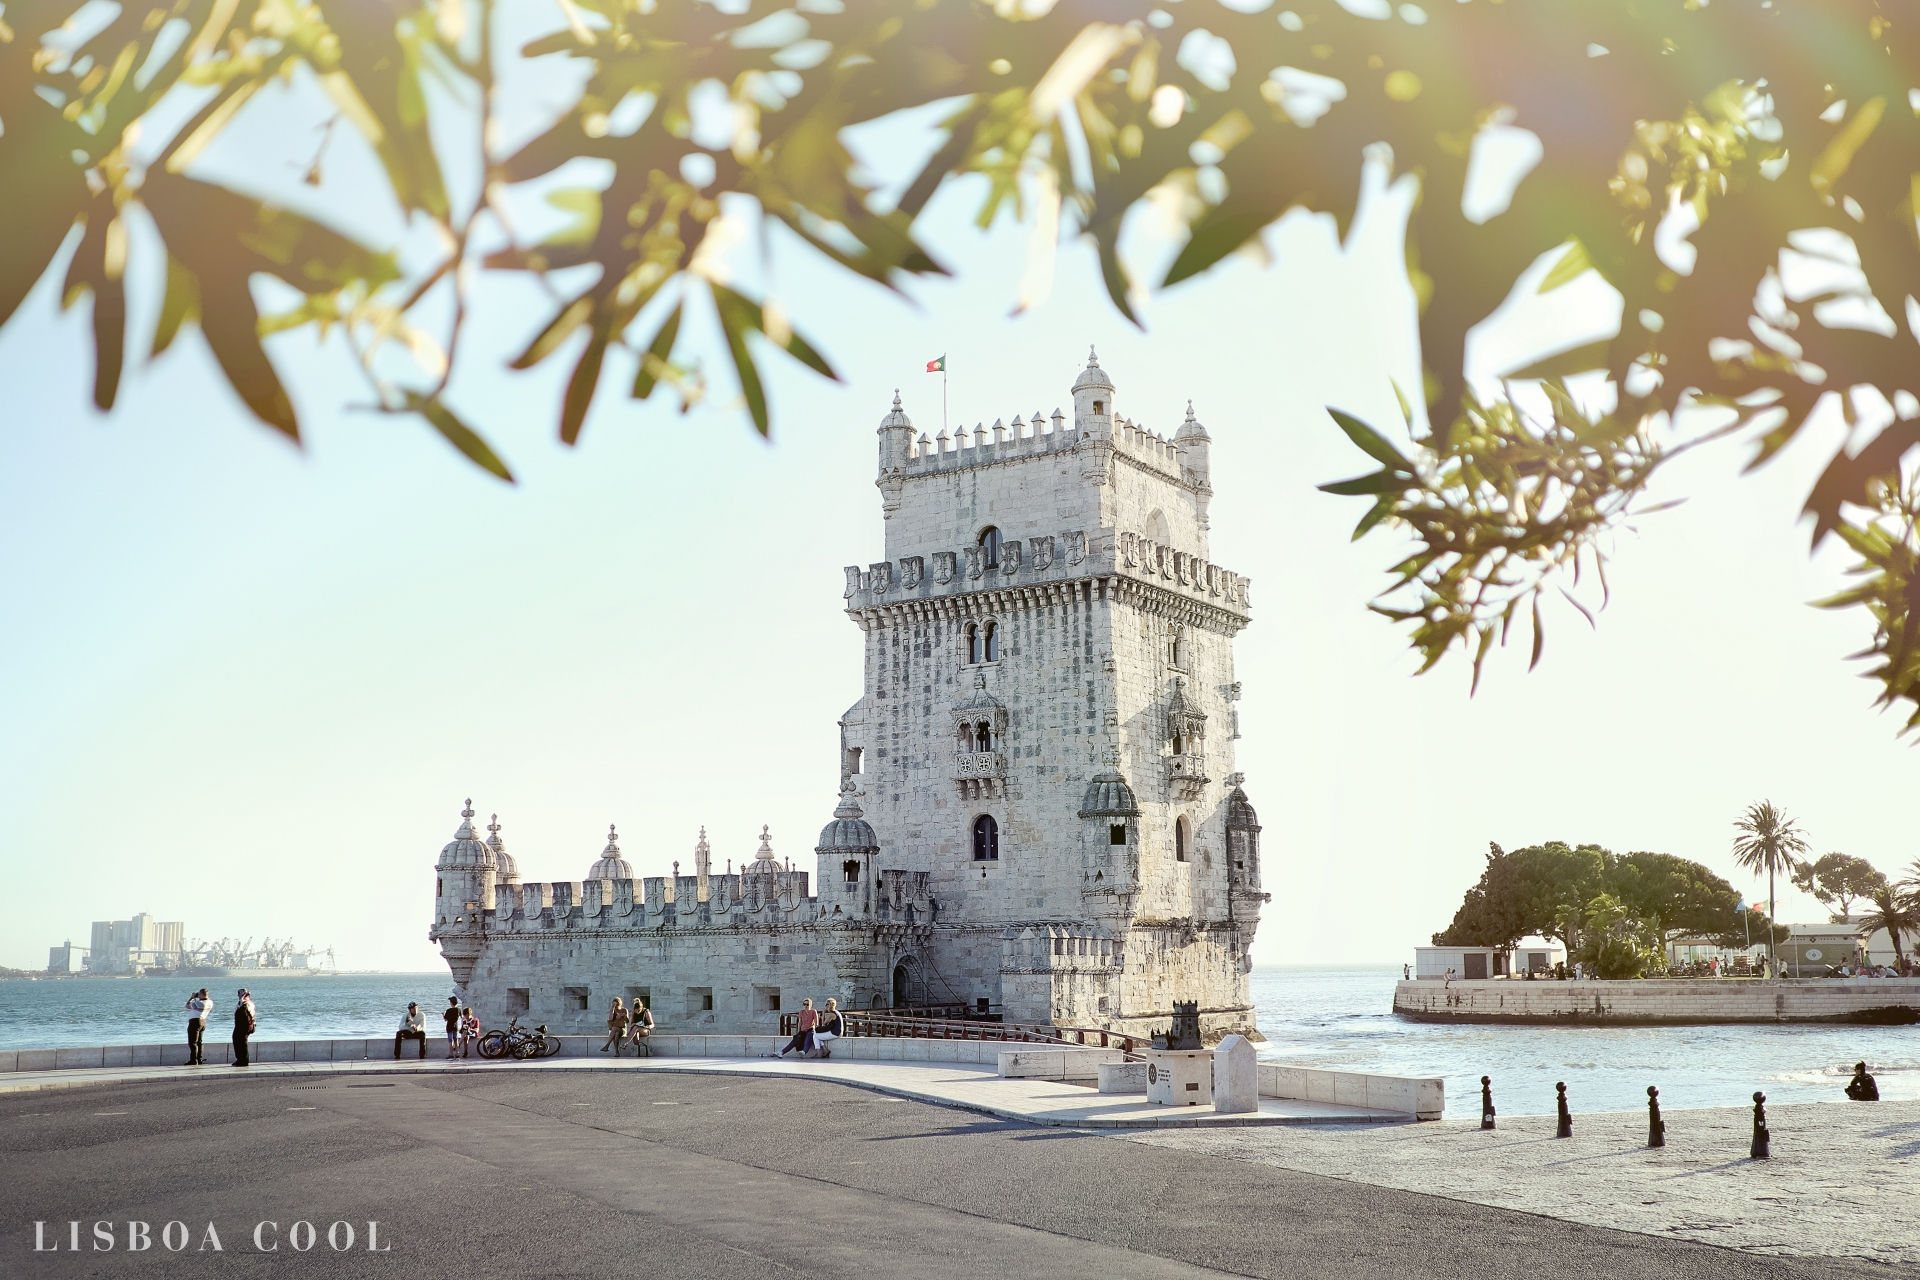 LisboaCool_Blog_7CuriosidadessobreLisboa